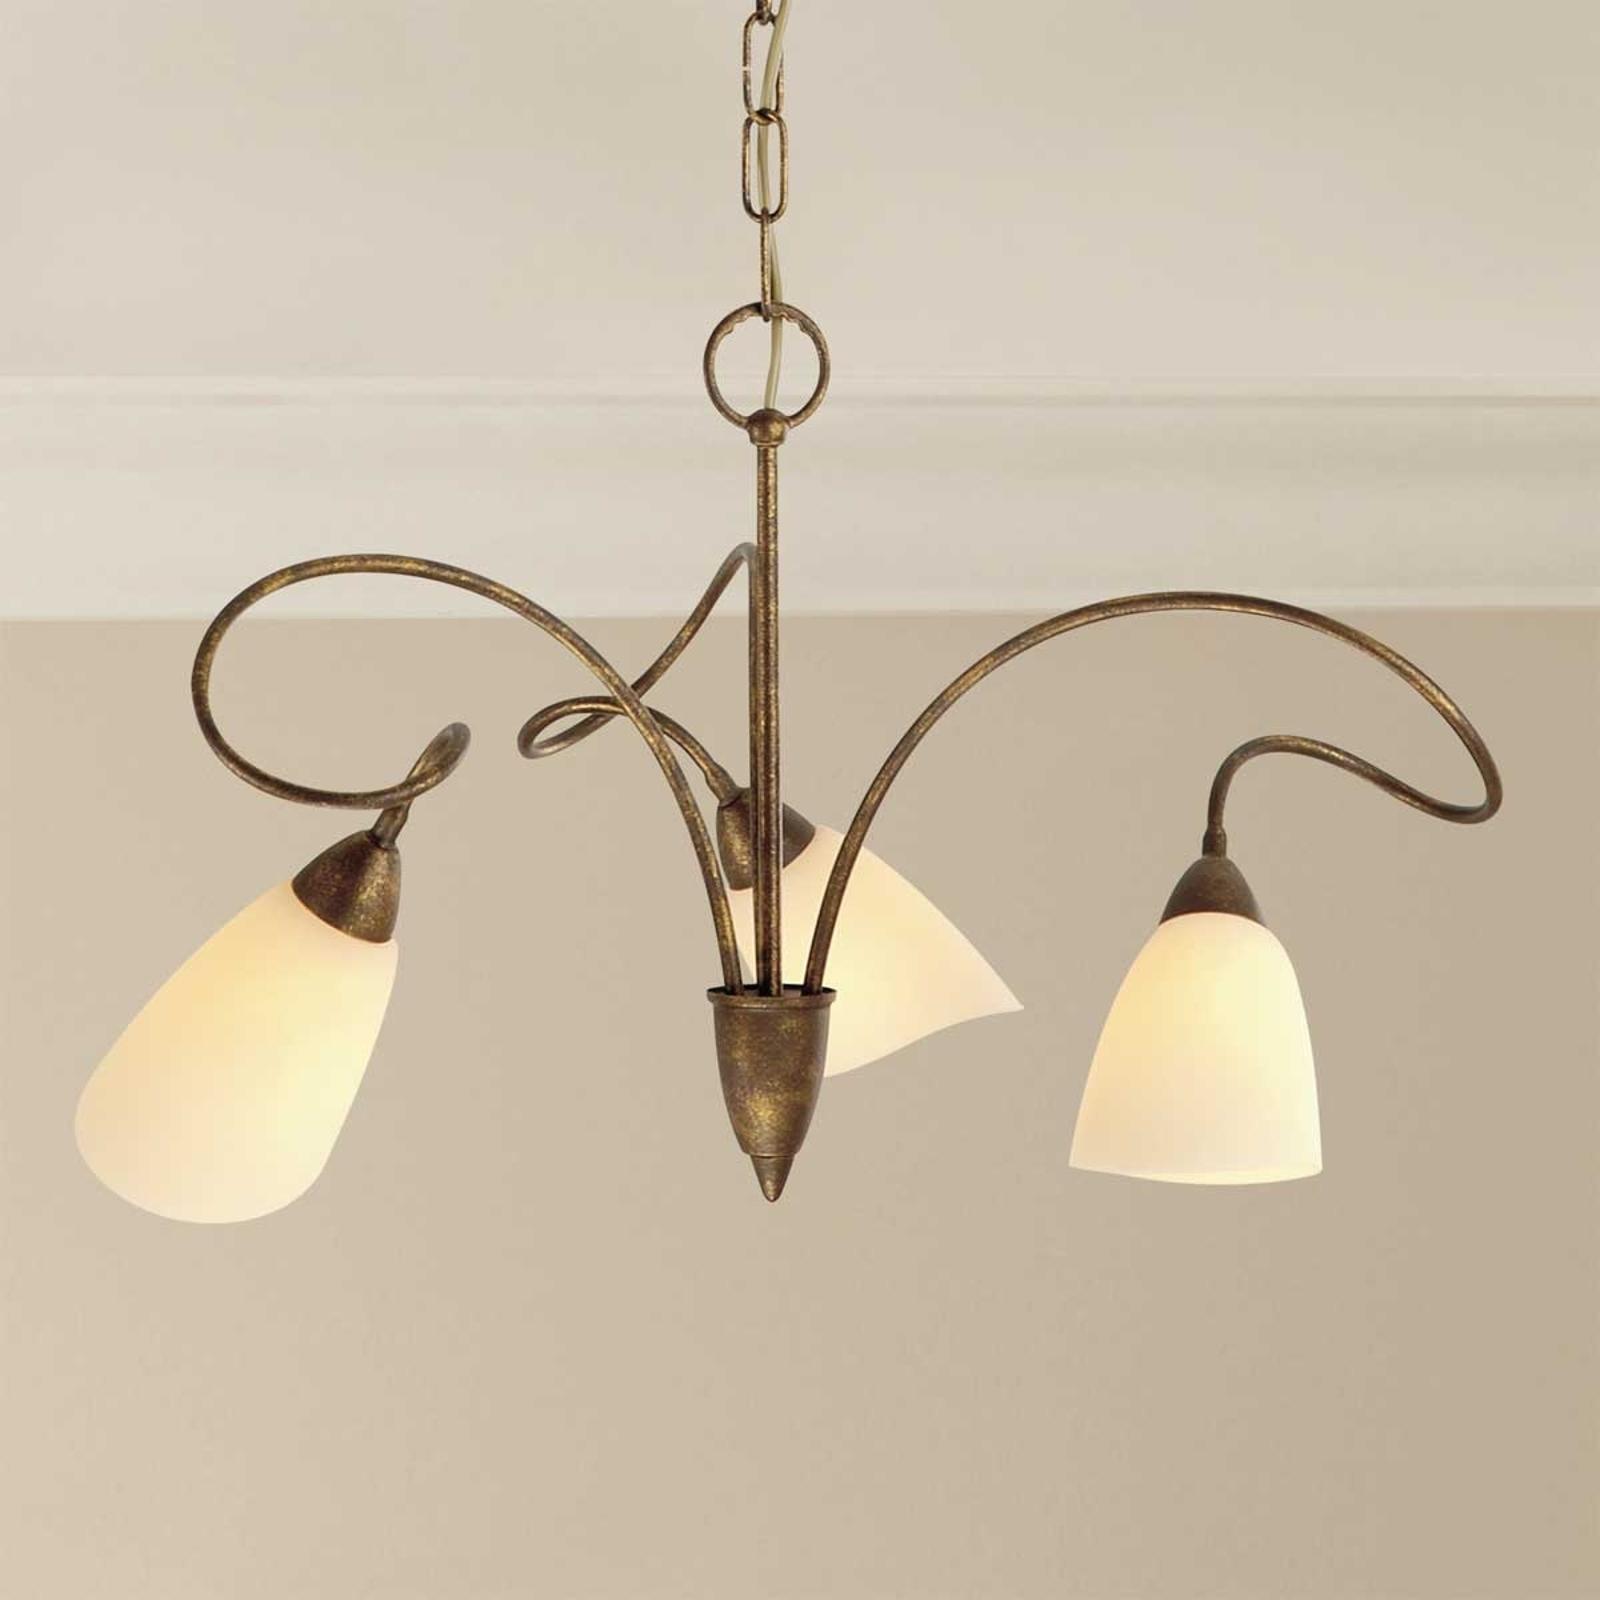 Suspension rustique Alessandro à 3 lampes